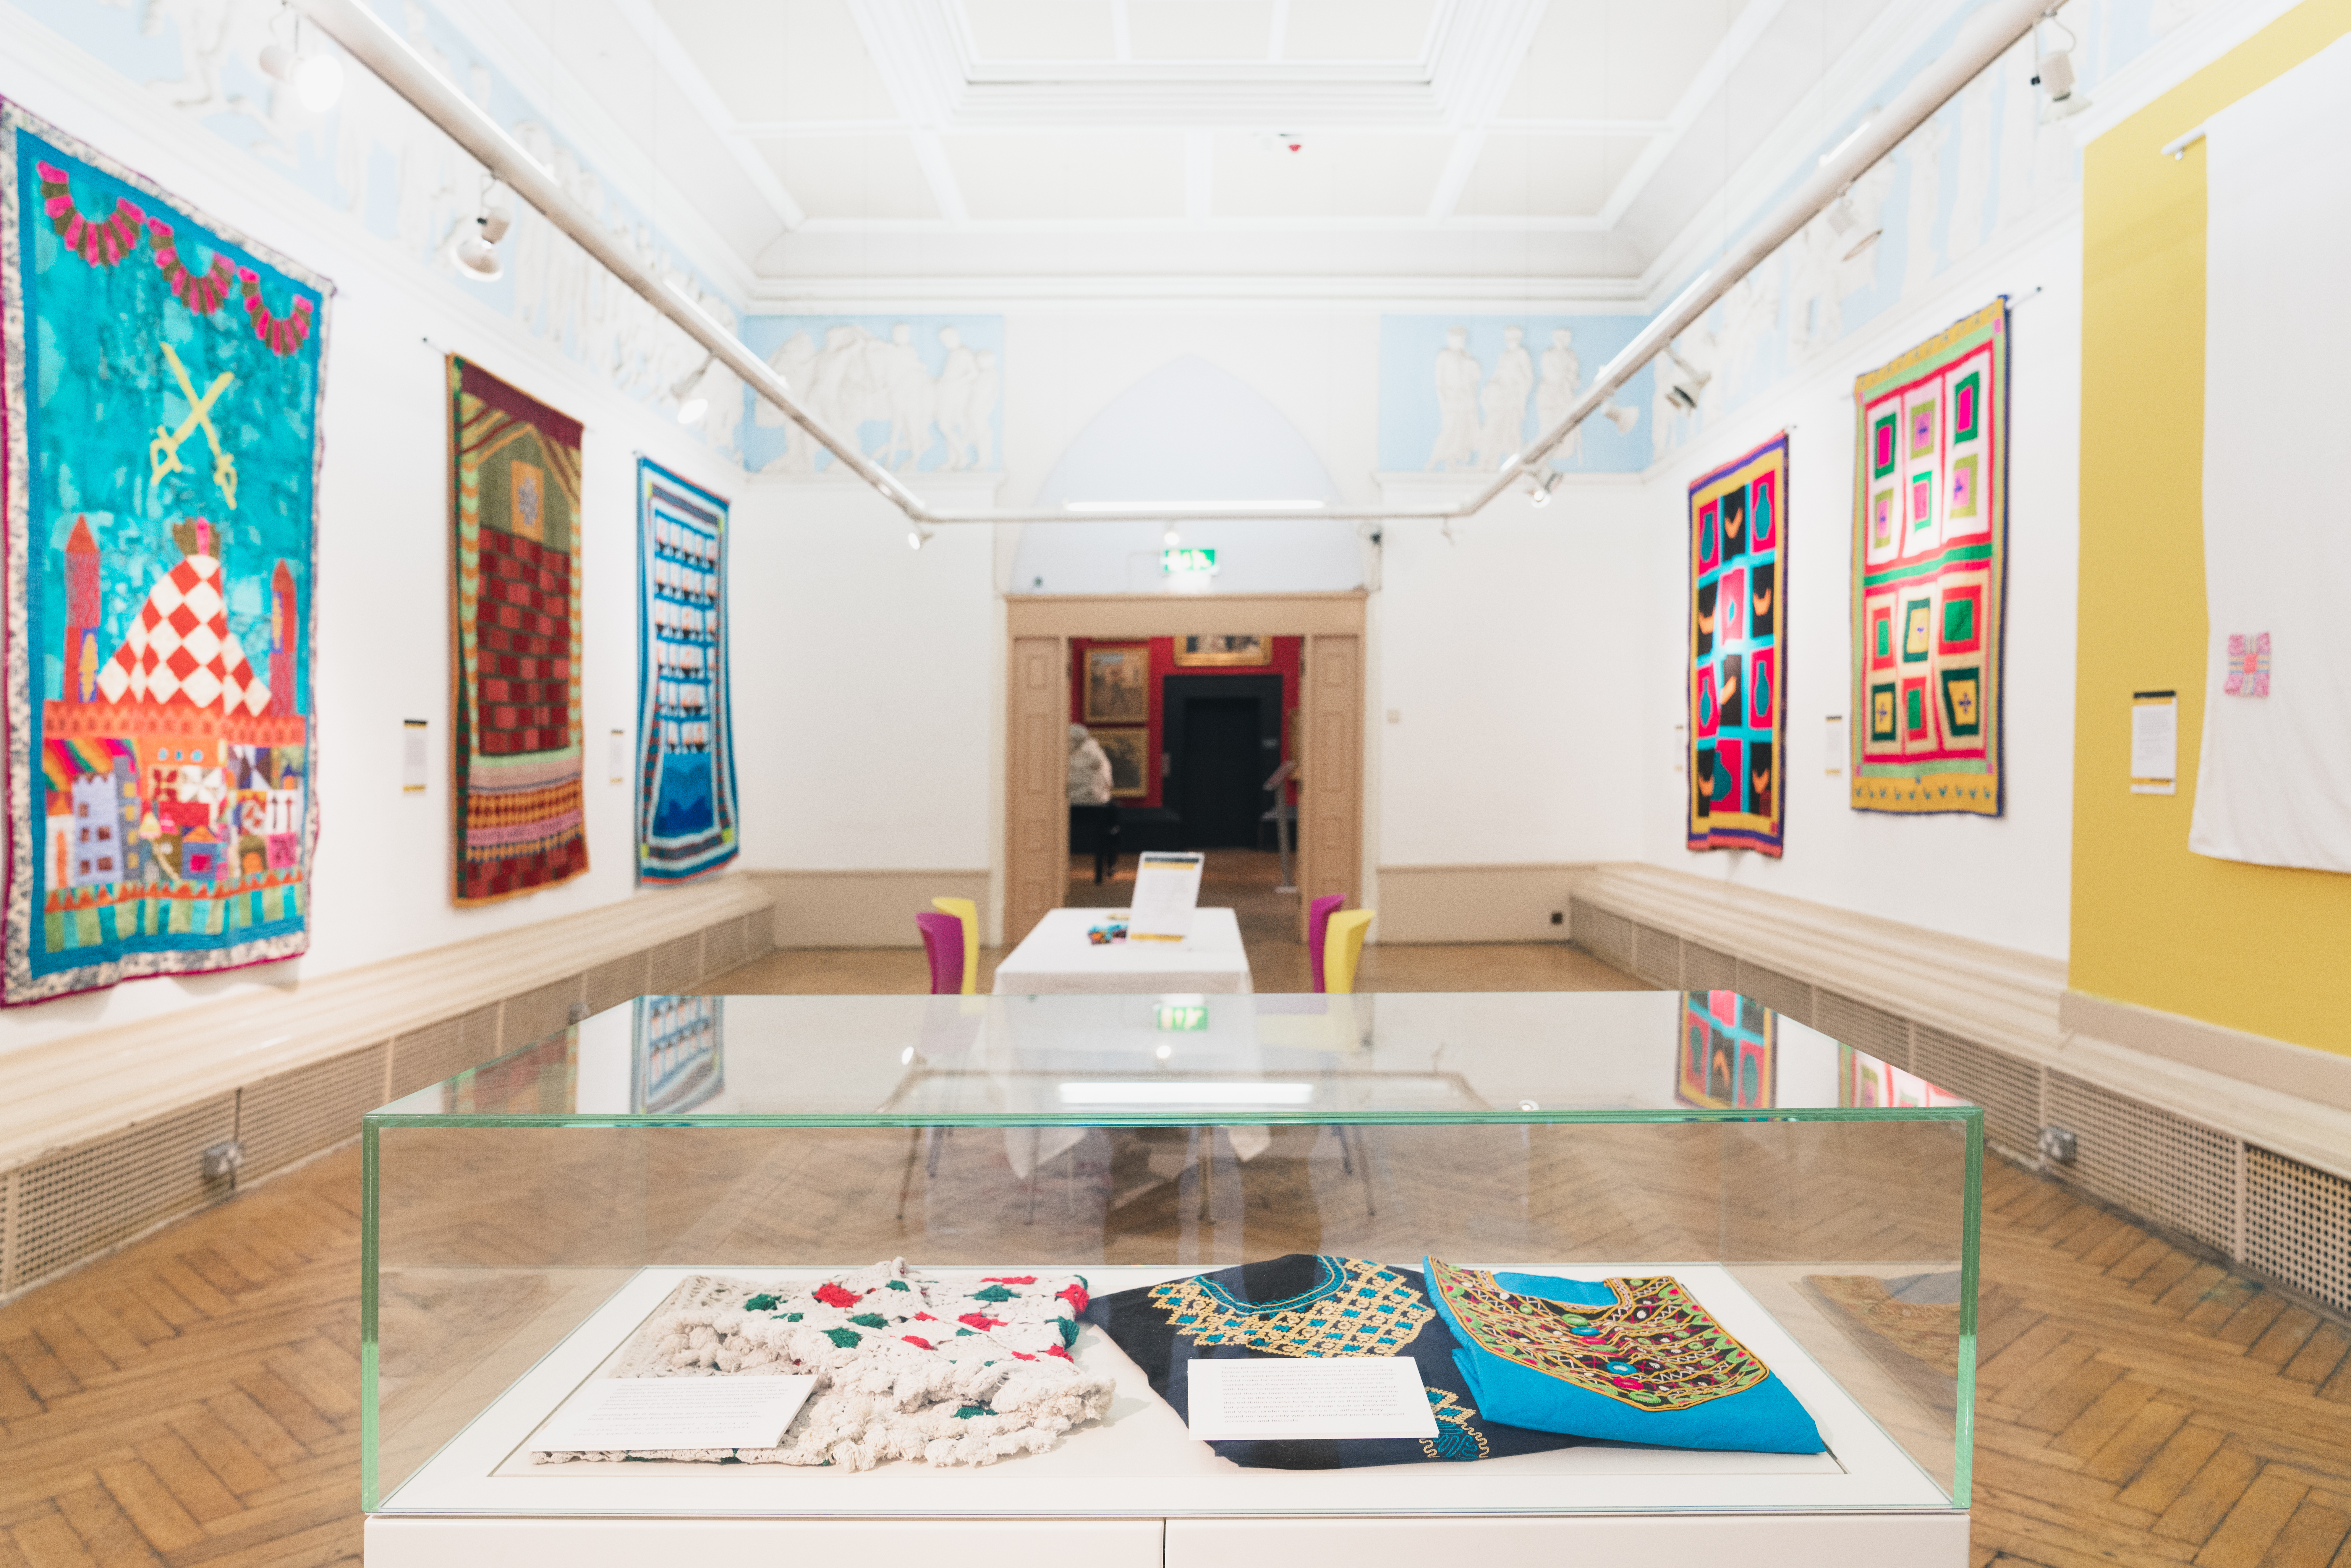 Katab Quilting Stories - Blackburn Museum - British Textile Biennial - 04-10-19 - Richard Tymon-3